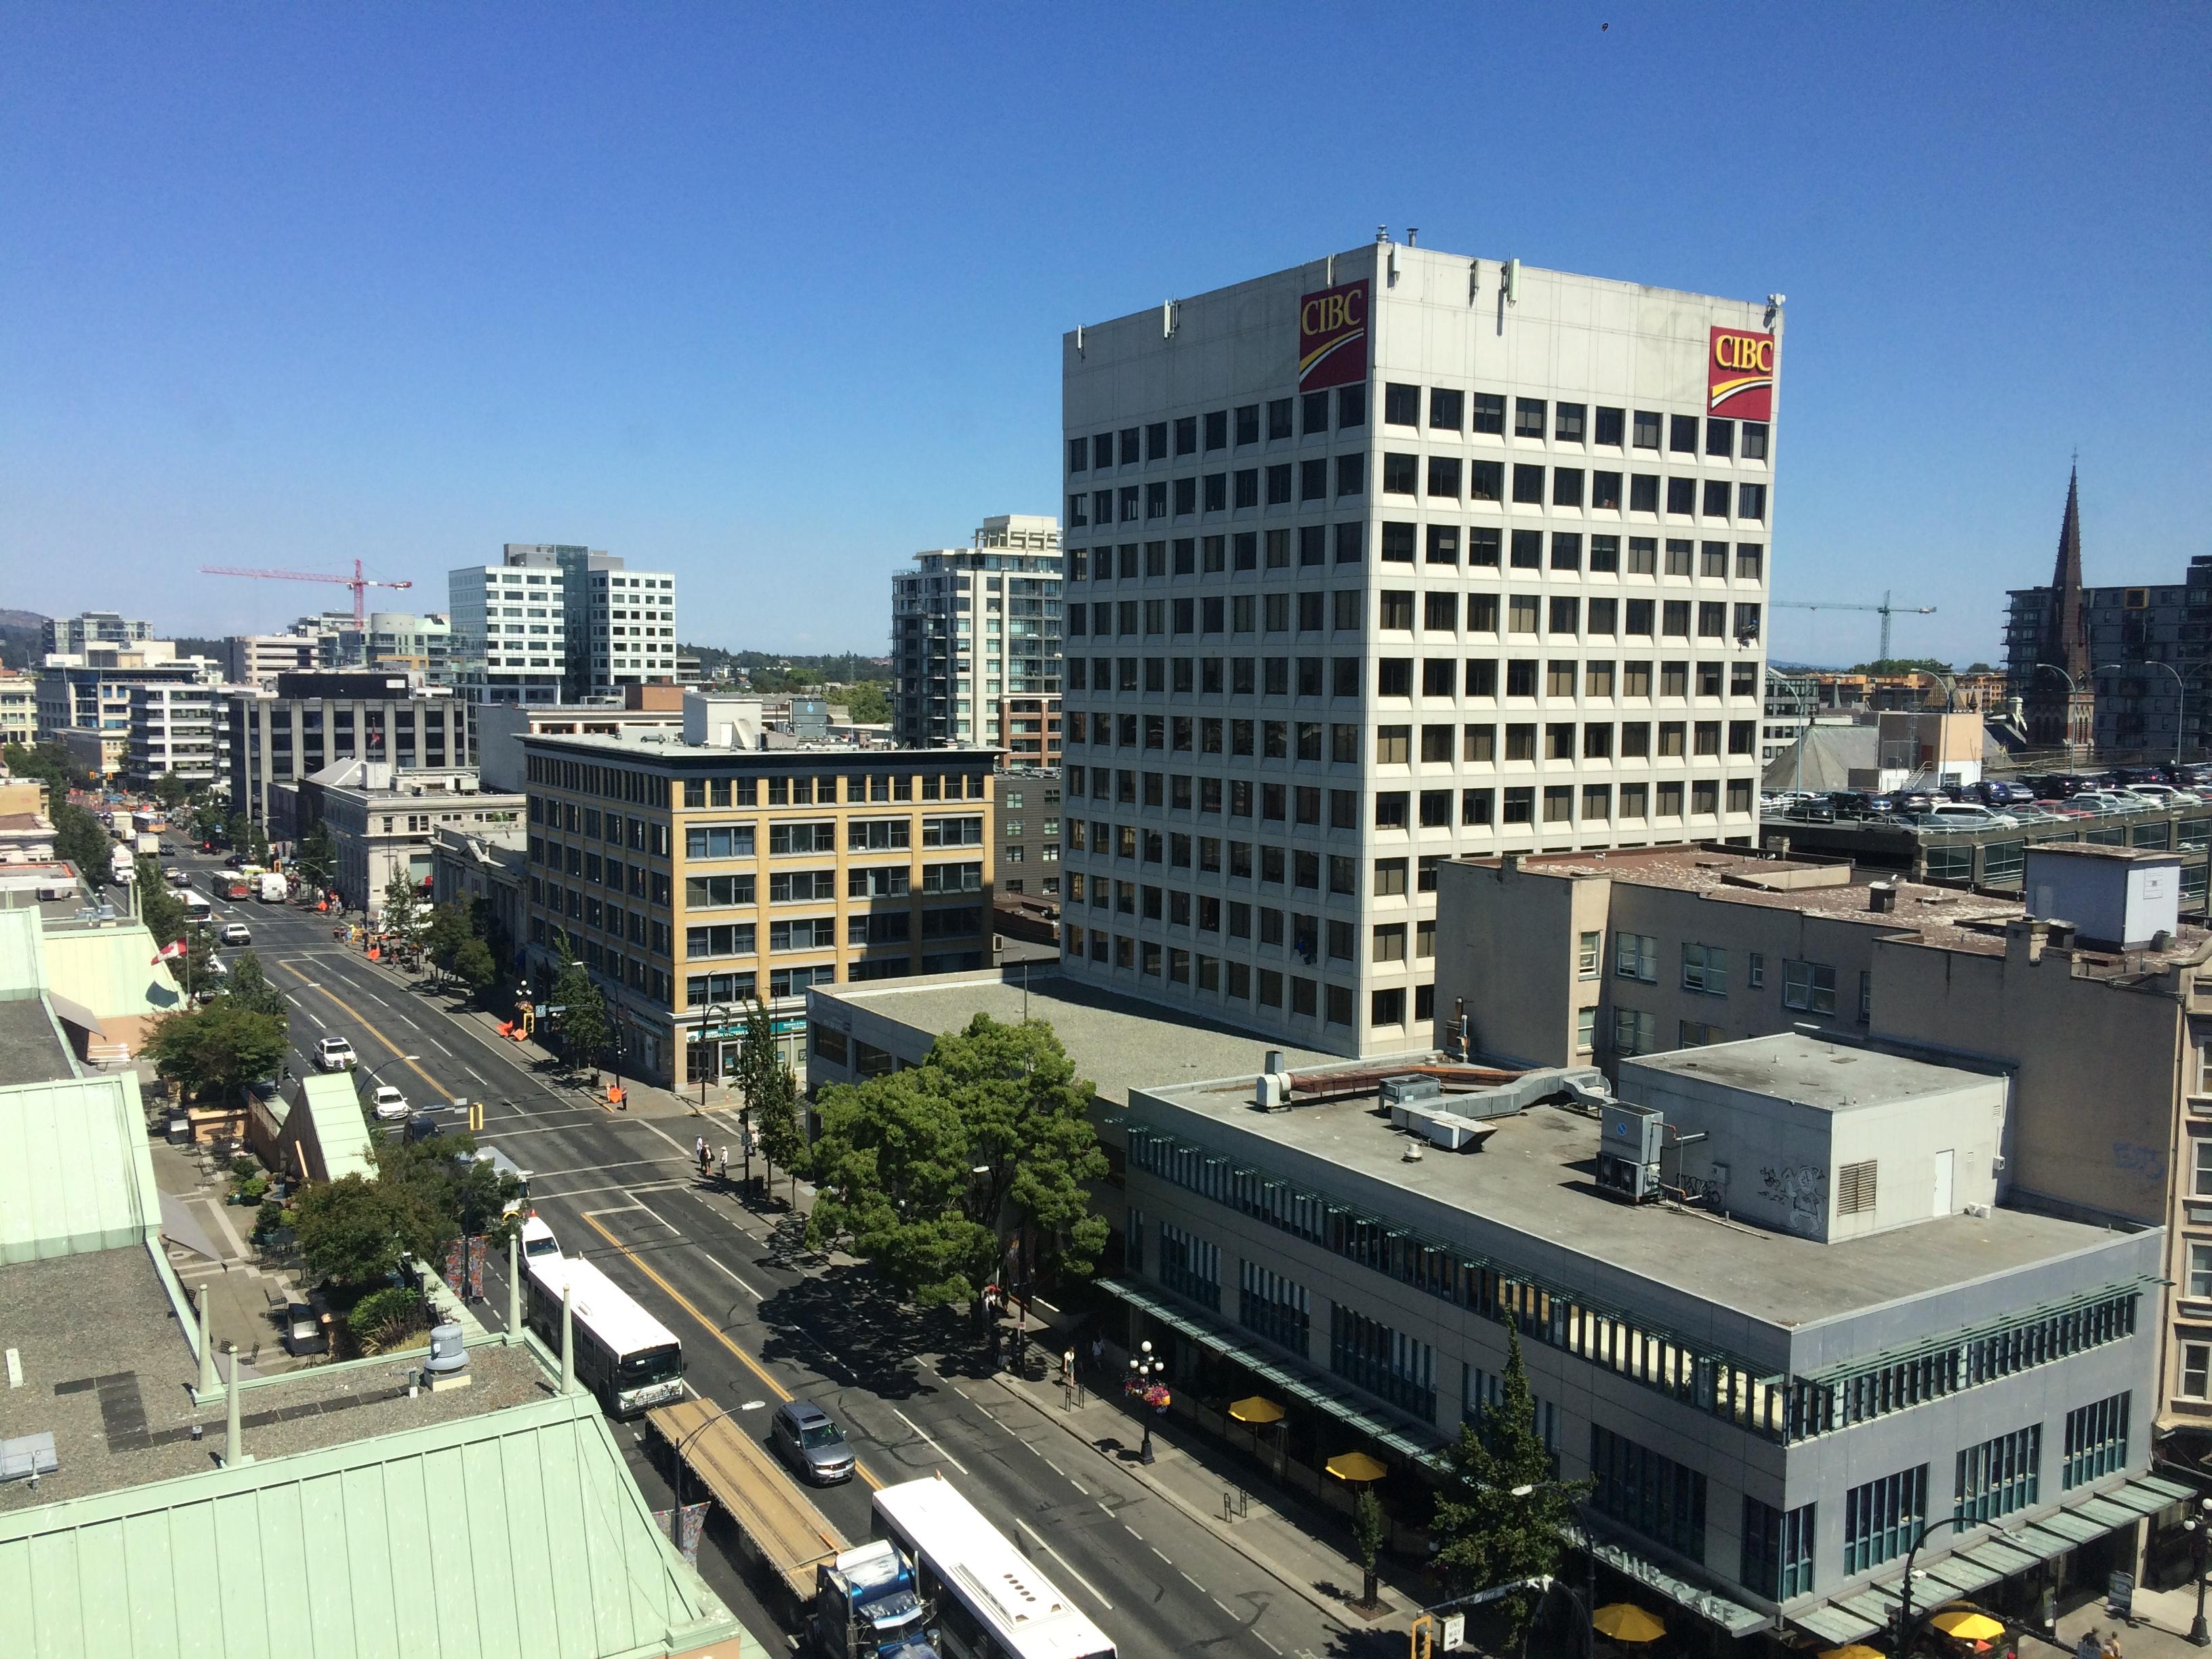 File:Victoria BC Downtown skyline.jpg - Wikimedia Commons